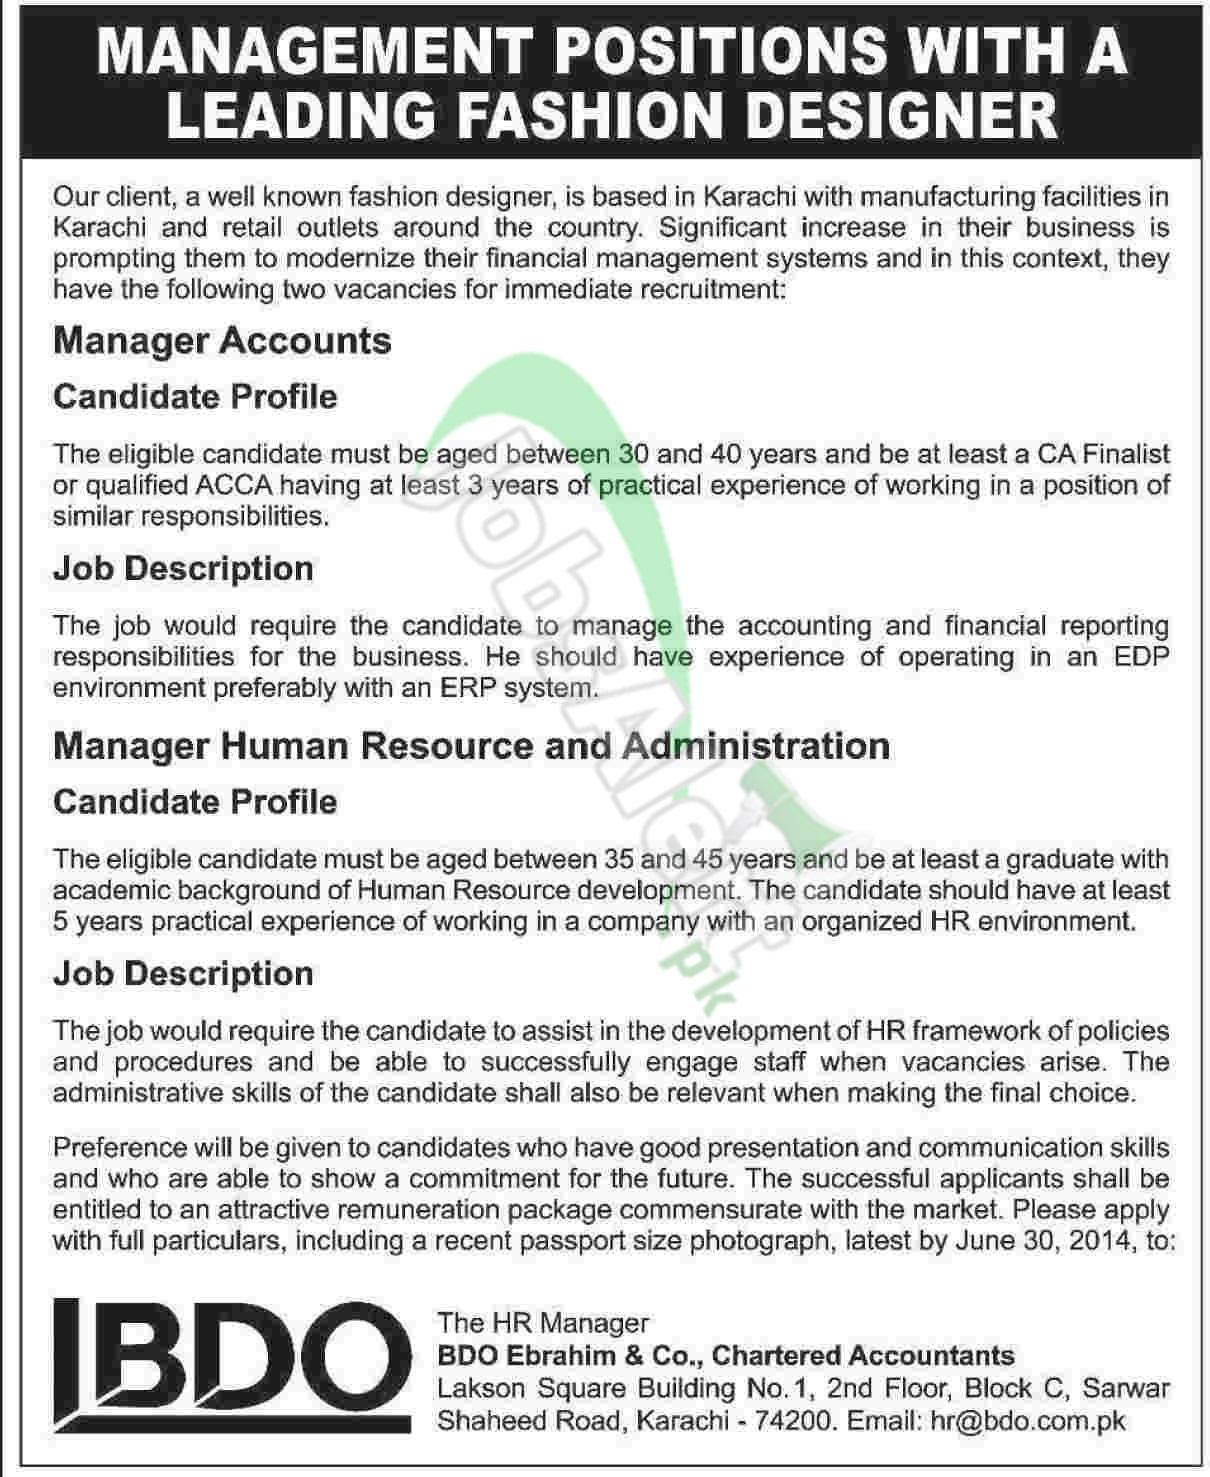 BDO Ebrahim & Co Chartered Accountants